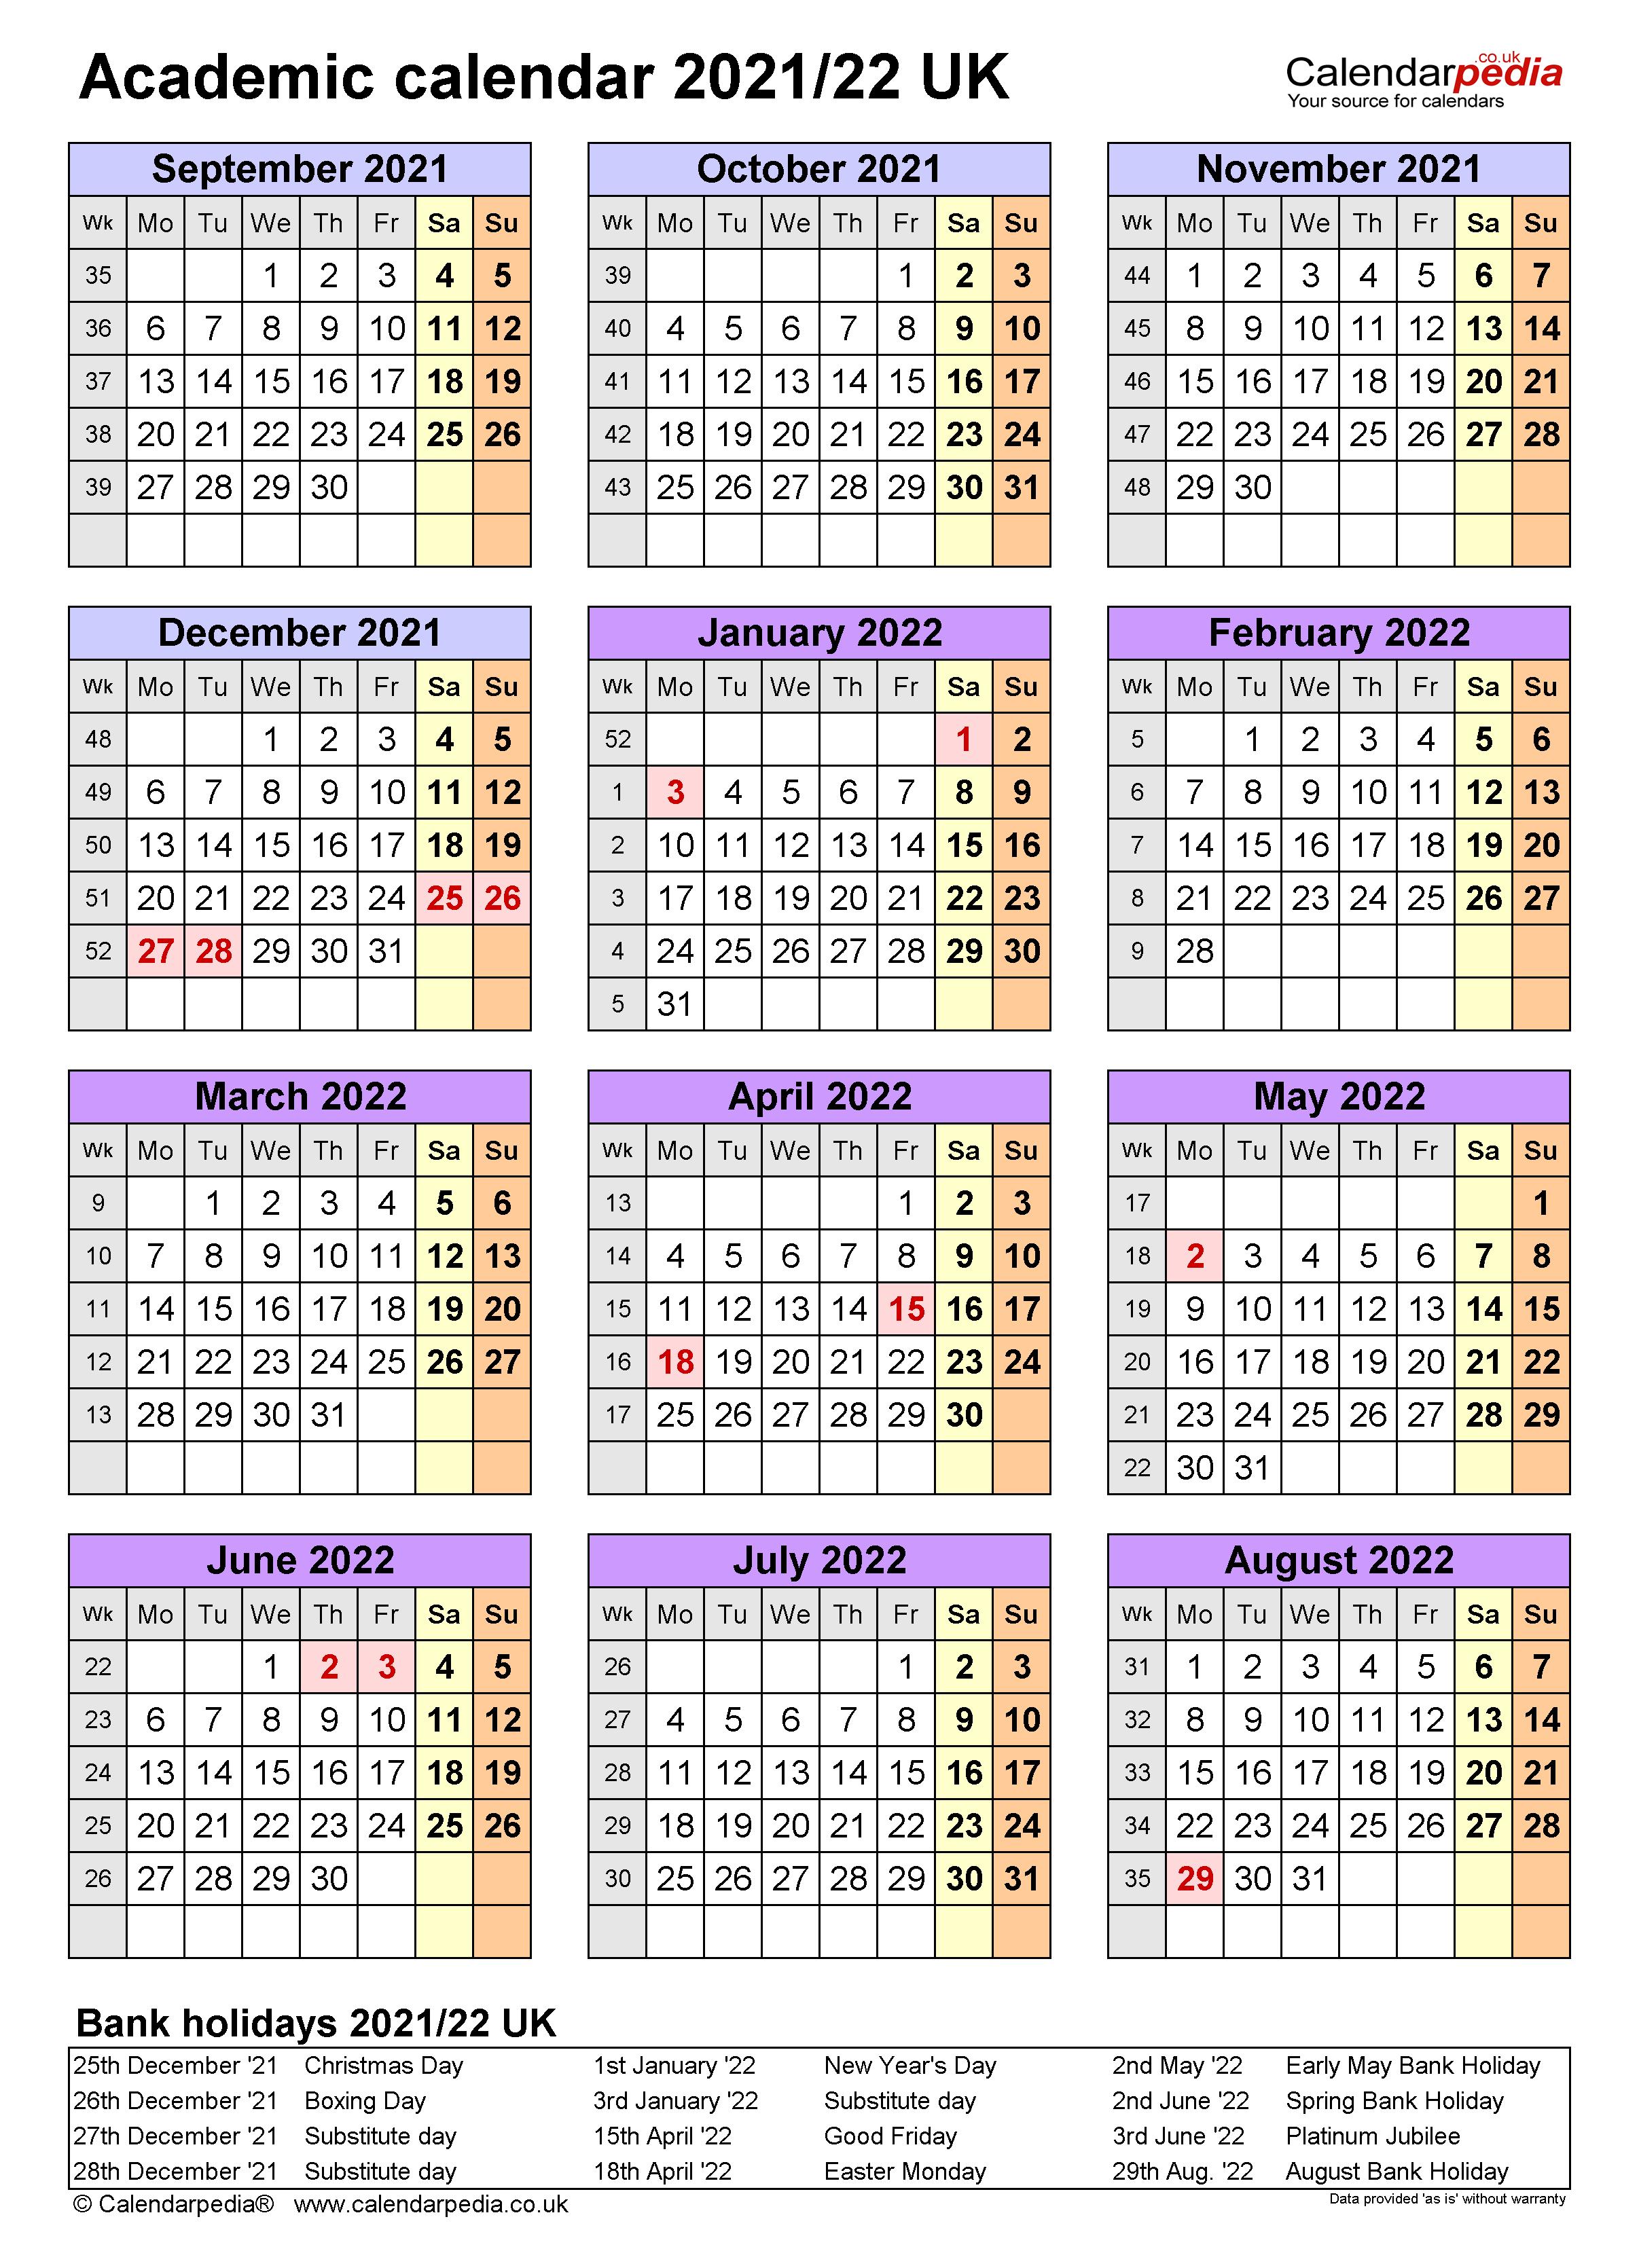 Queens College Academic Calendar Spring 2022.Academic Calendars 2021 22 Uk Free Printable Excel Templates